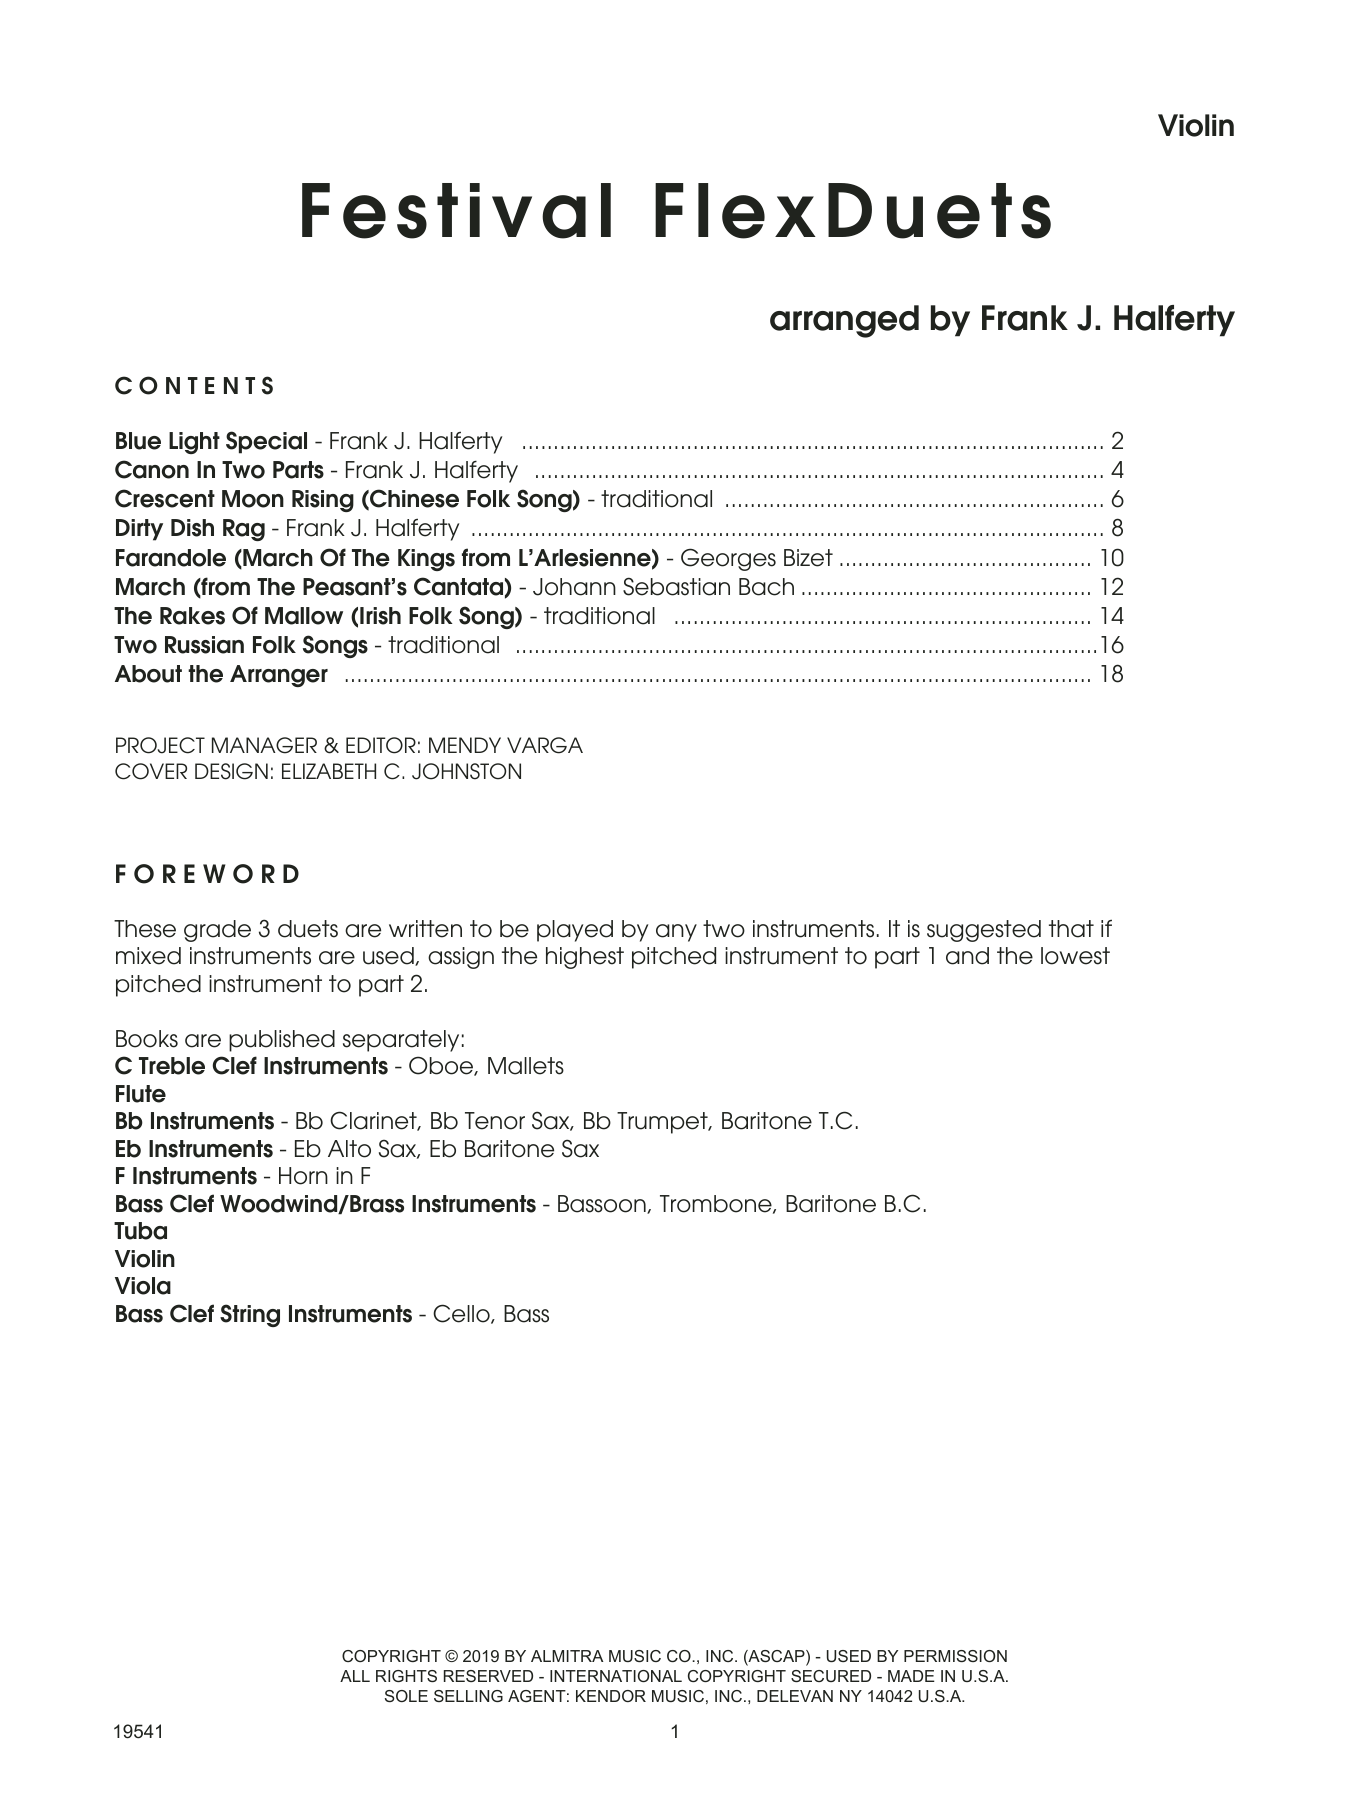 Frank J. Halferty Festival FlexDuets - Violin sheet music notes and chords. Download Printable PDF.